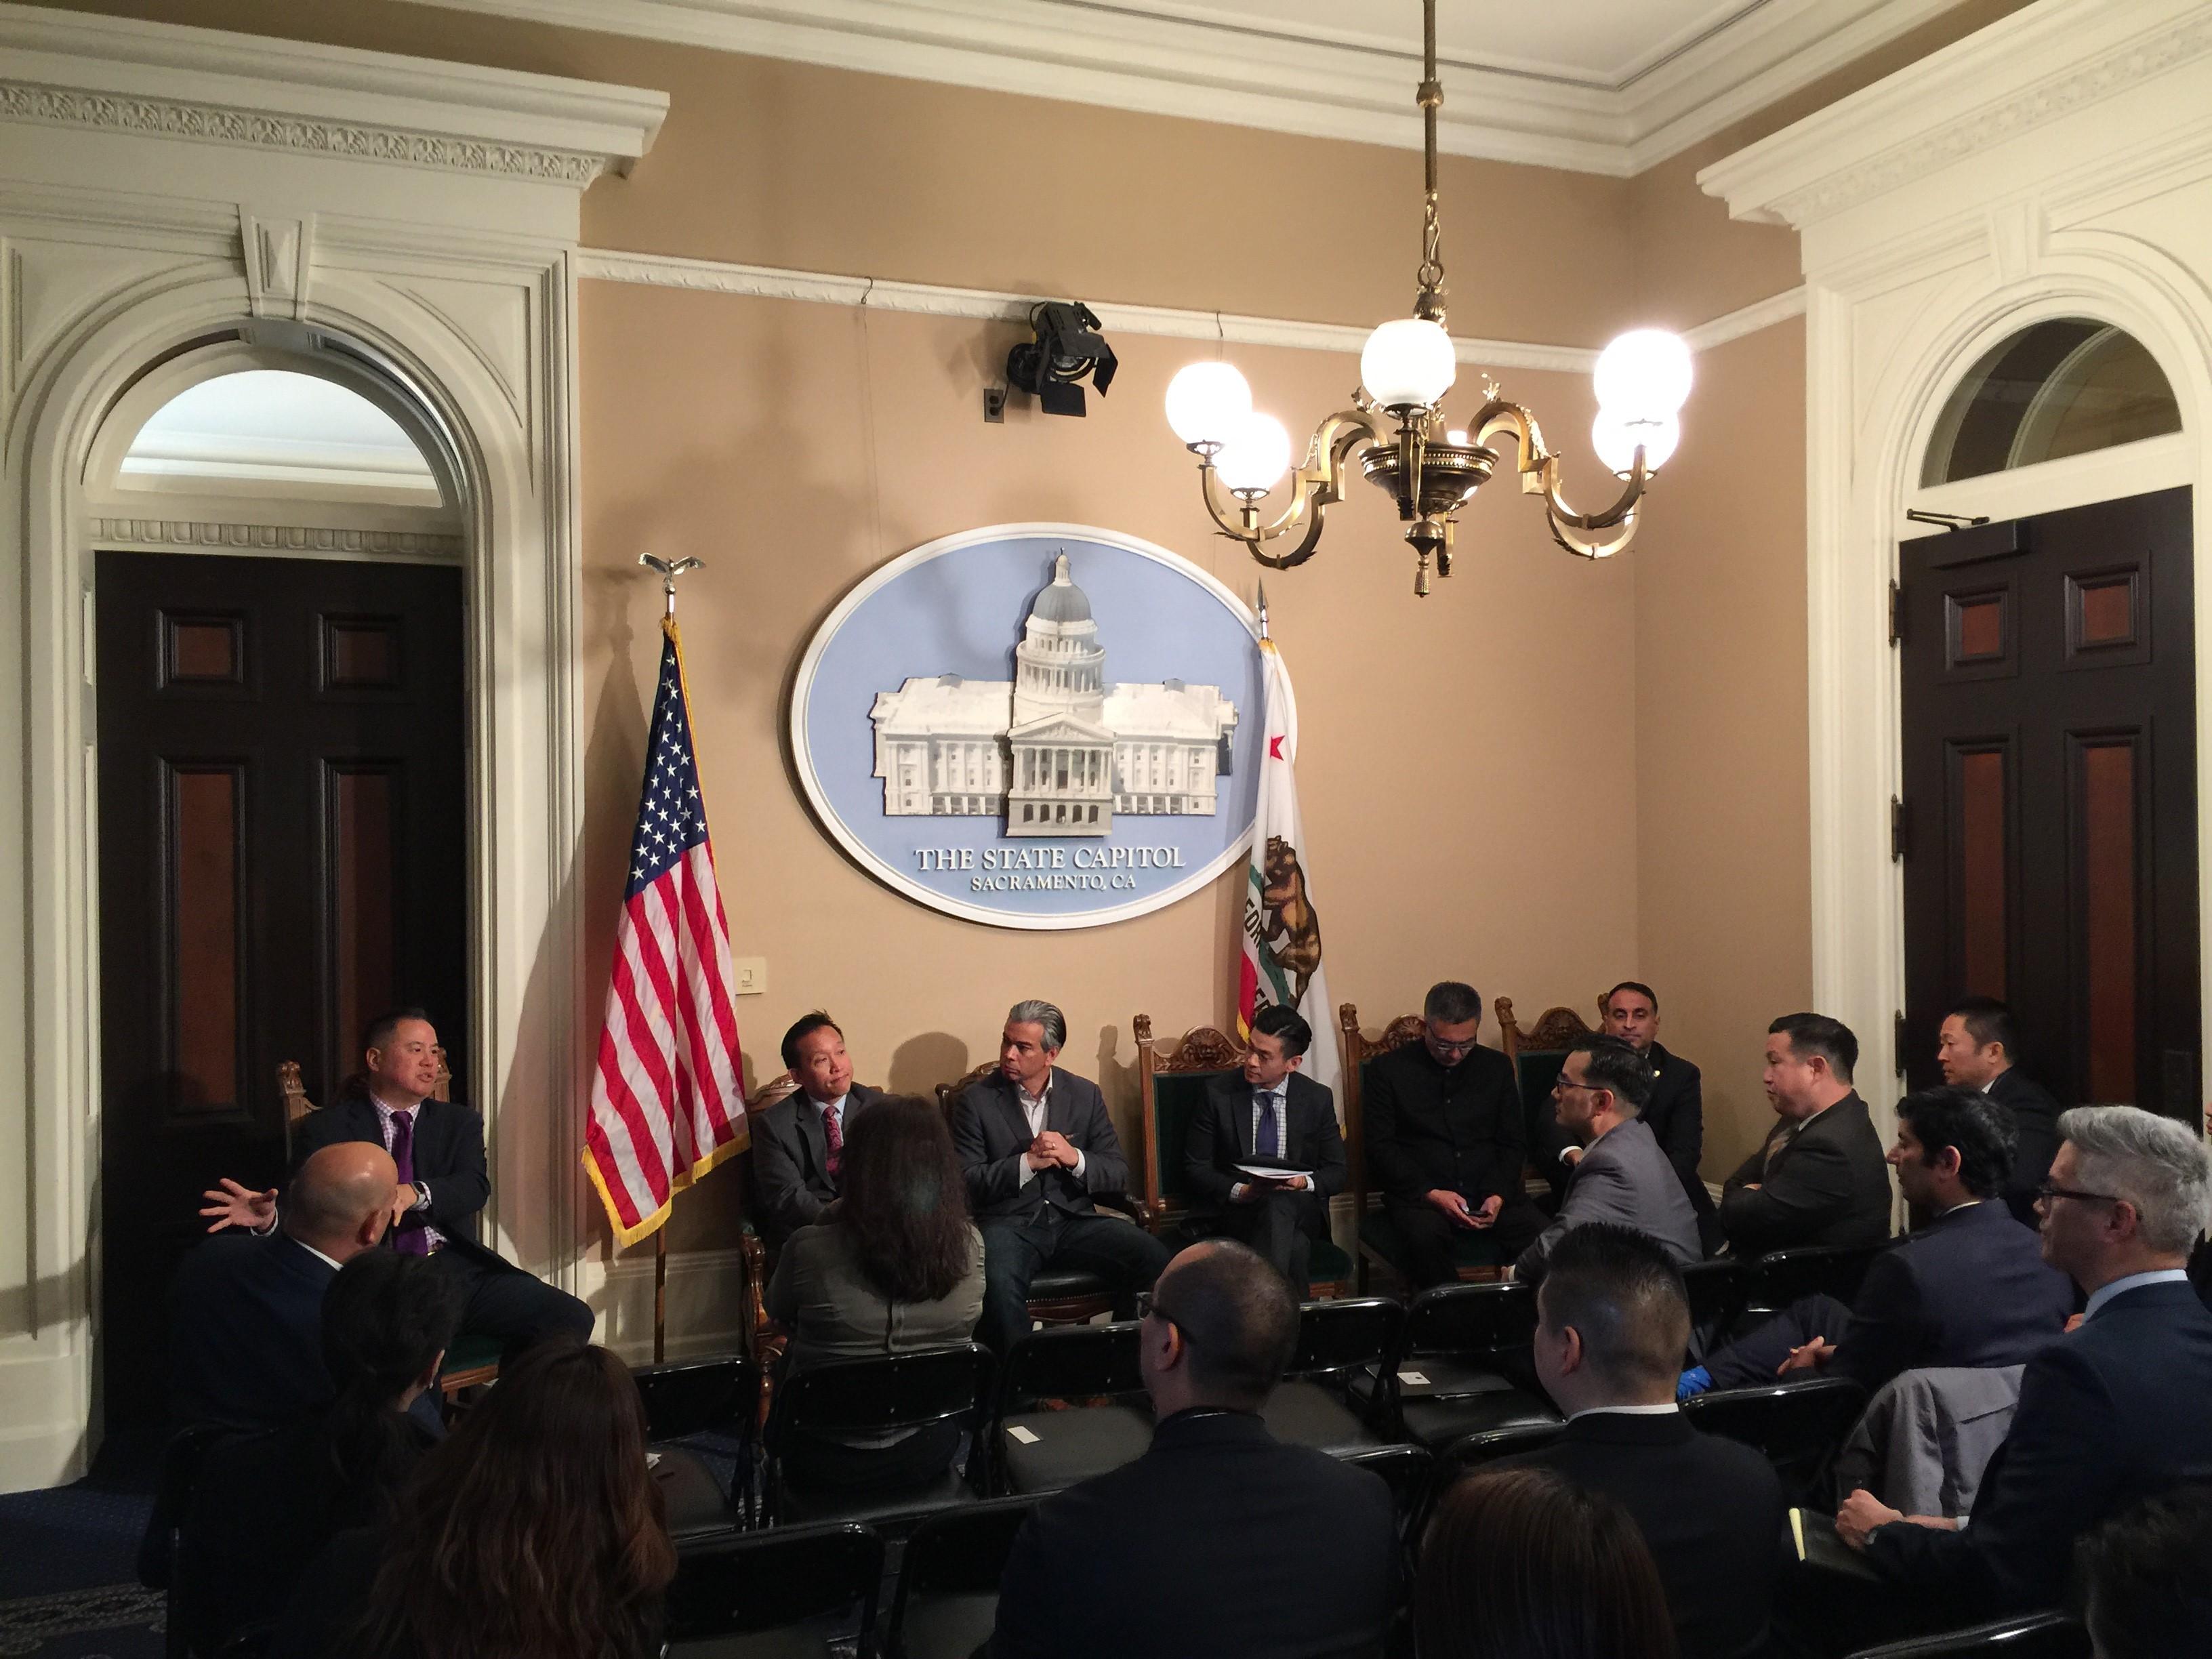 california lobby day api caucus